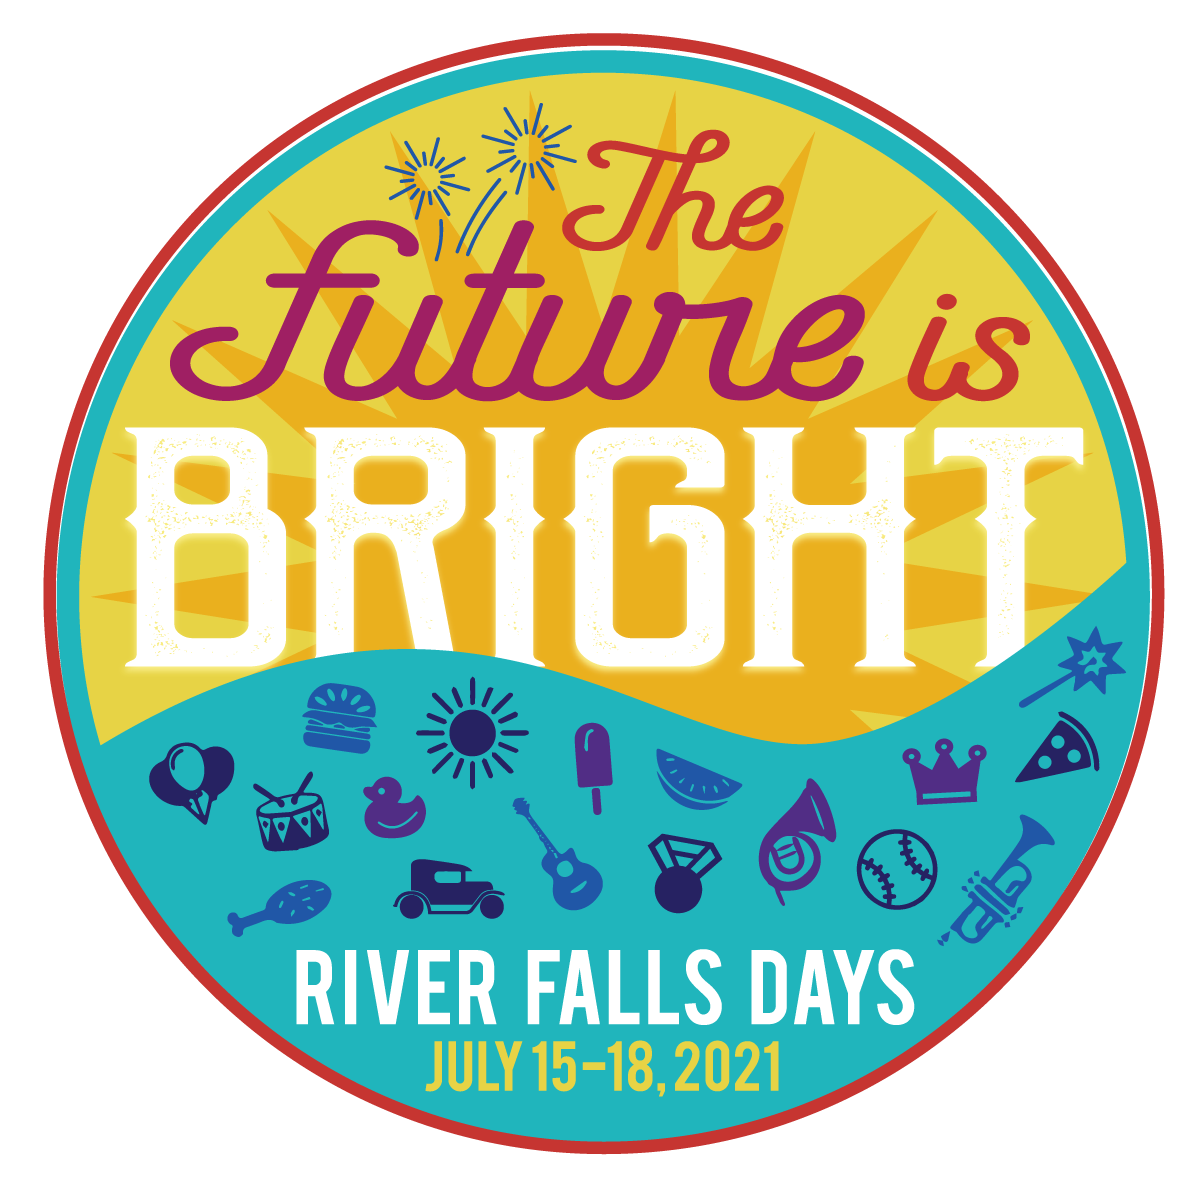 River Falls Days 2021